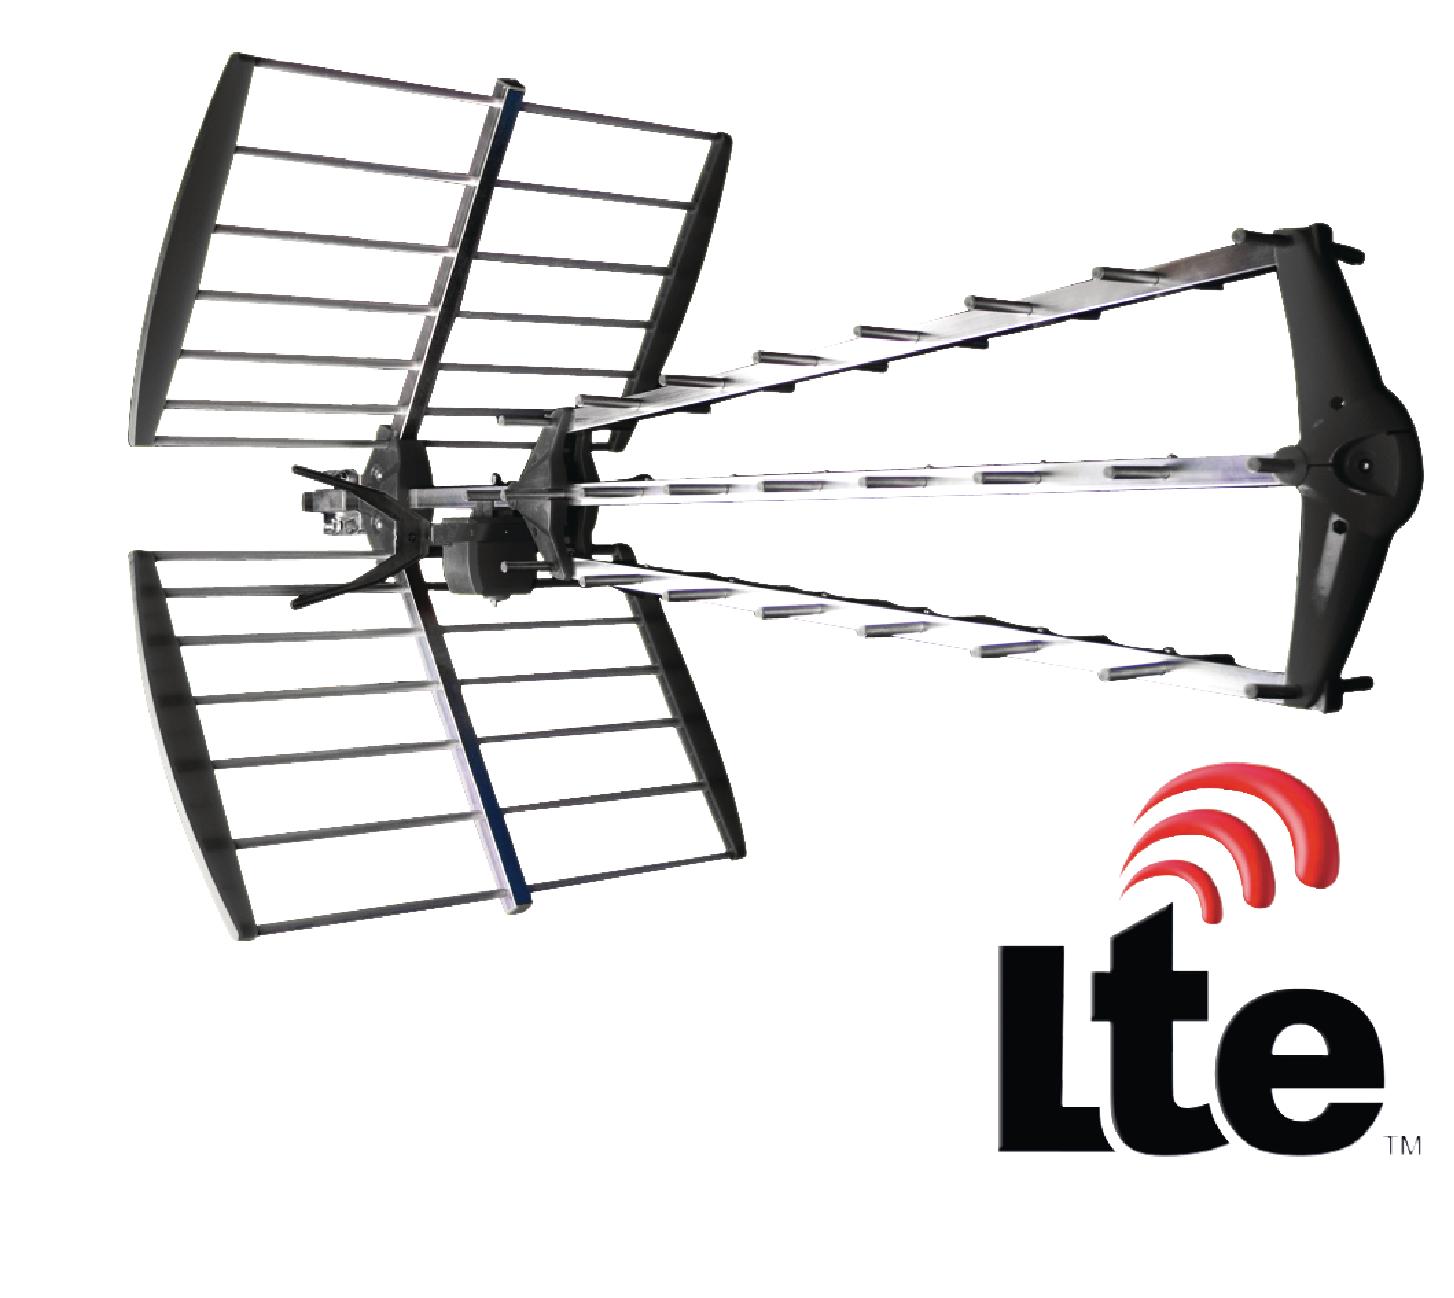 Anténa UHF DVB-T/T2 LTE 15.5 dB König ANT-UHF52L-KN